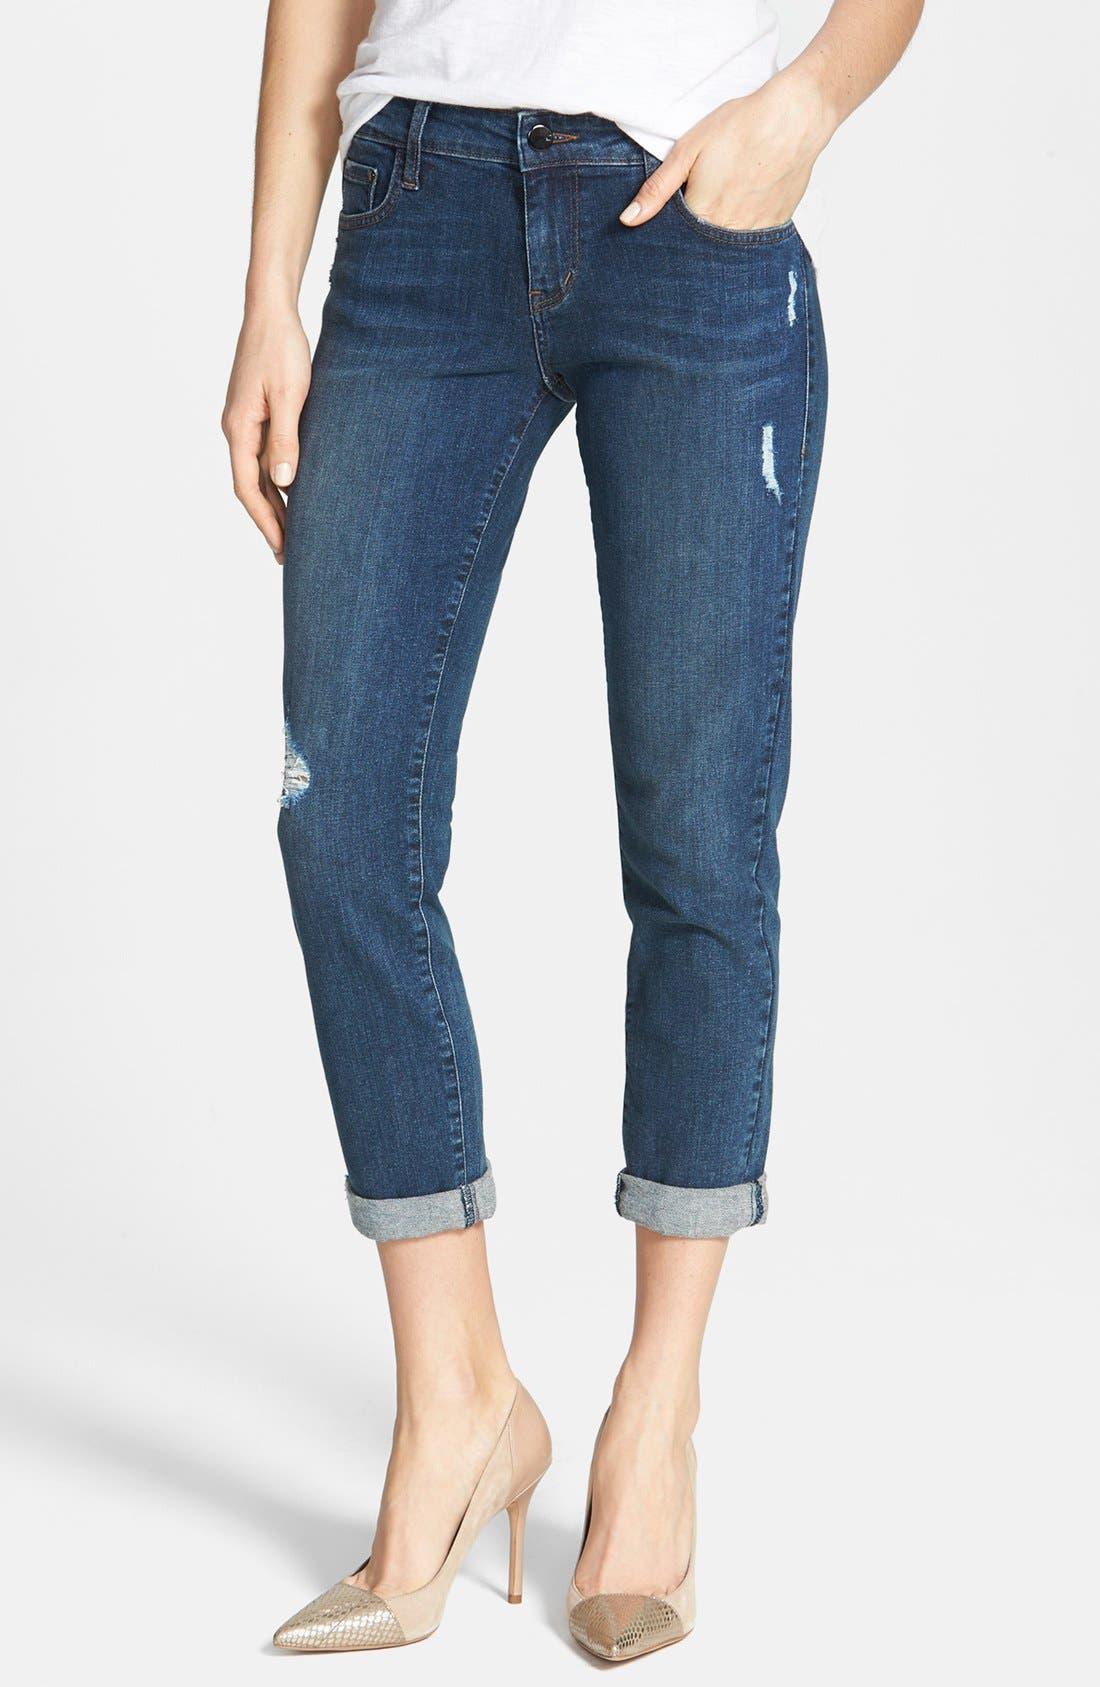 Alternate Image 1 Selected - !iT Collective 'Alex' Boyfriend Jeans (Lakespur)